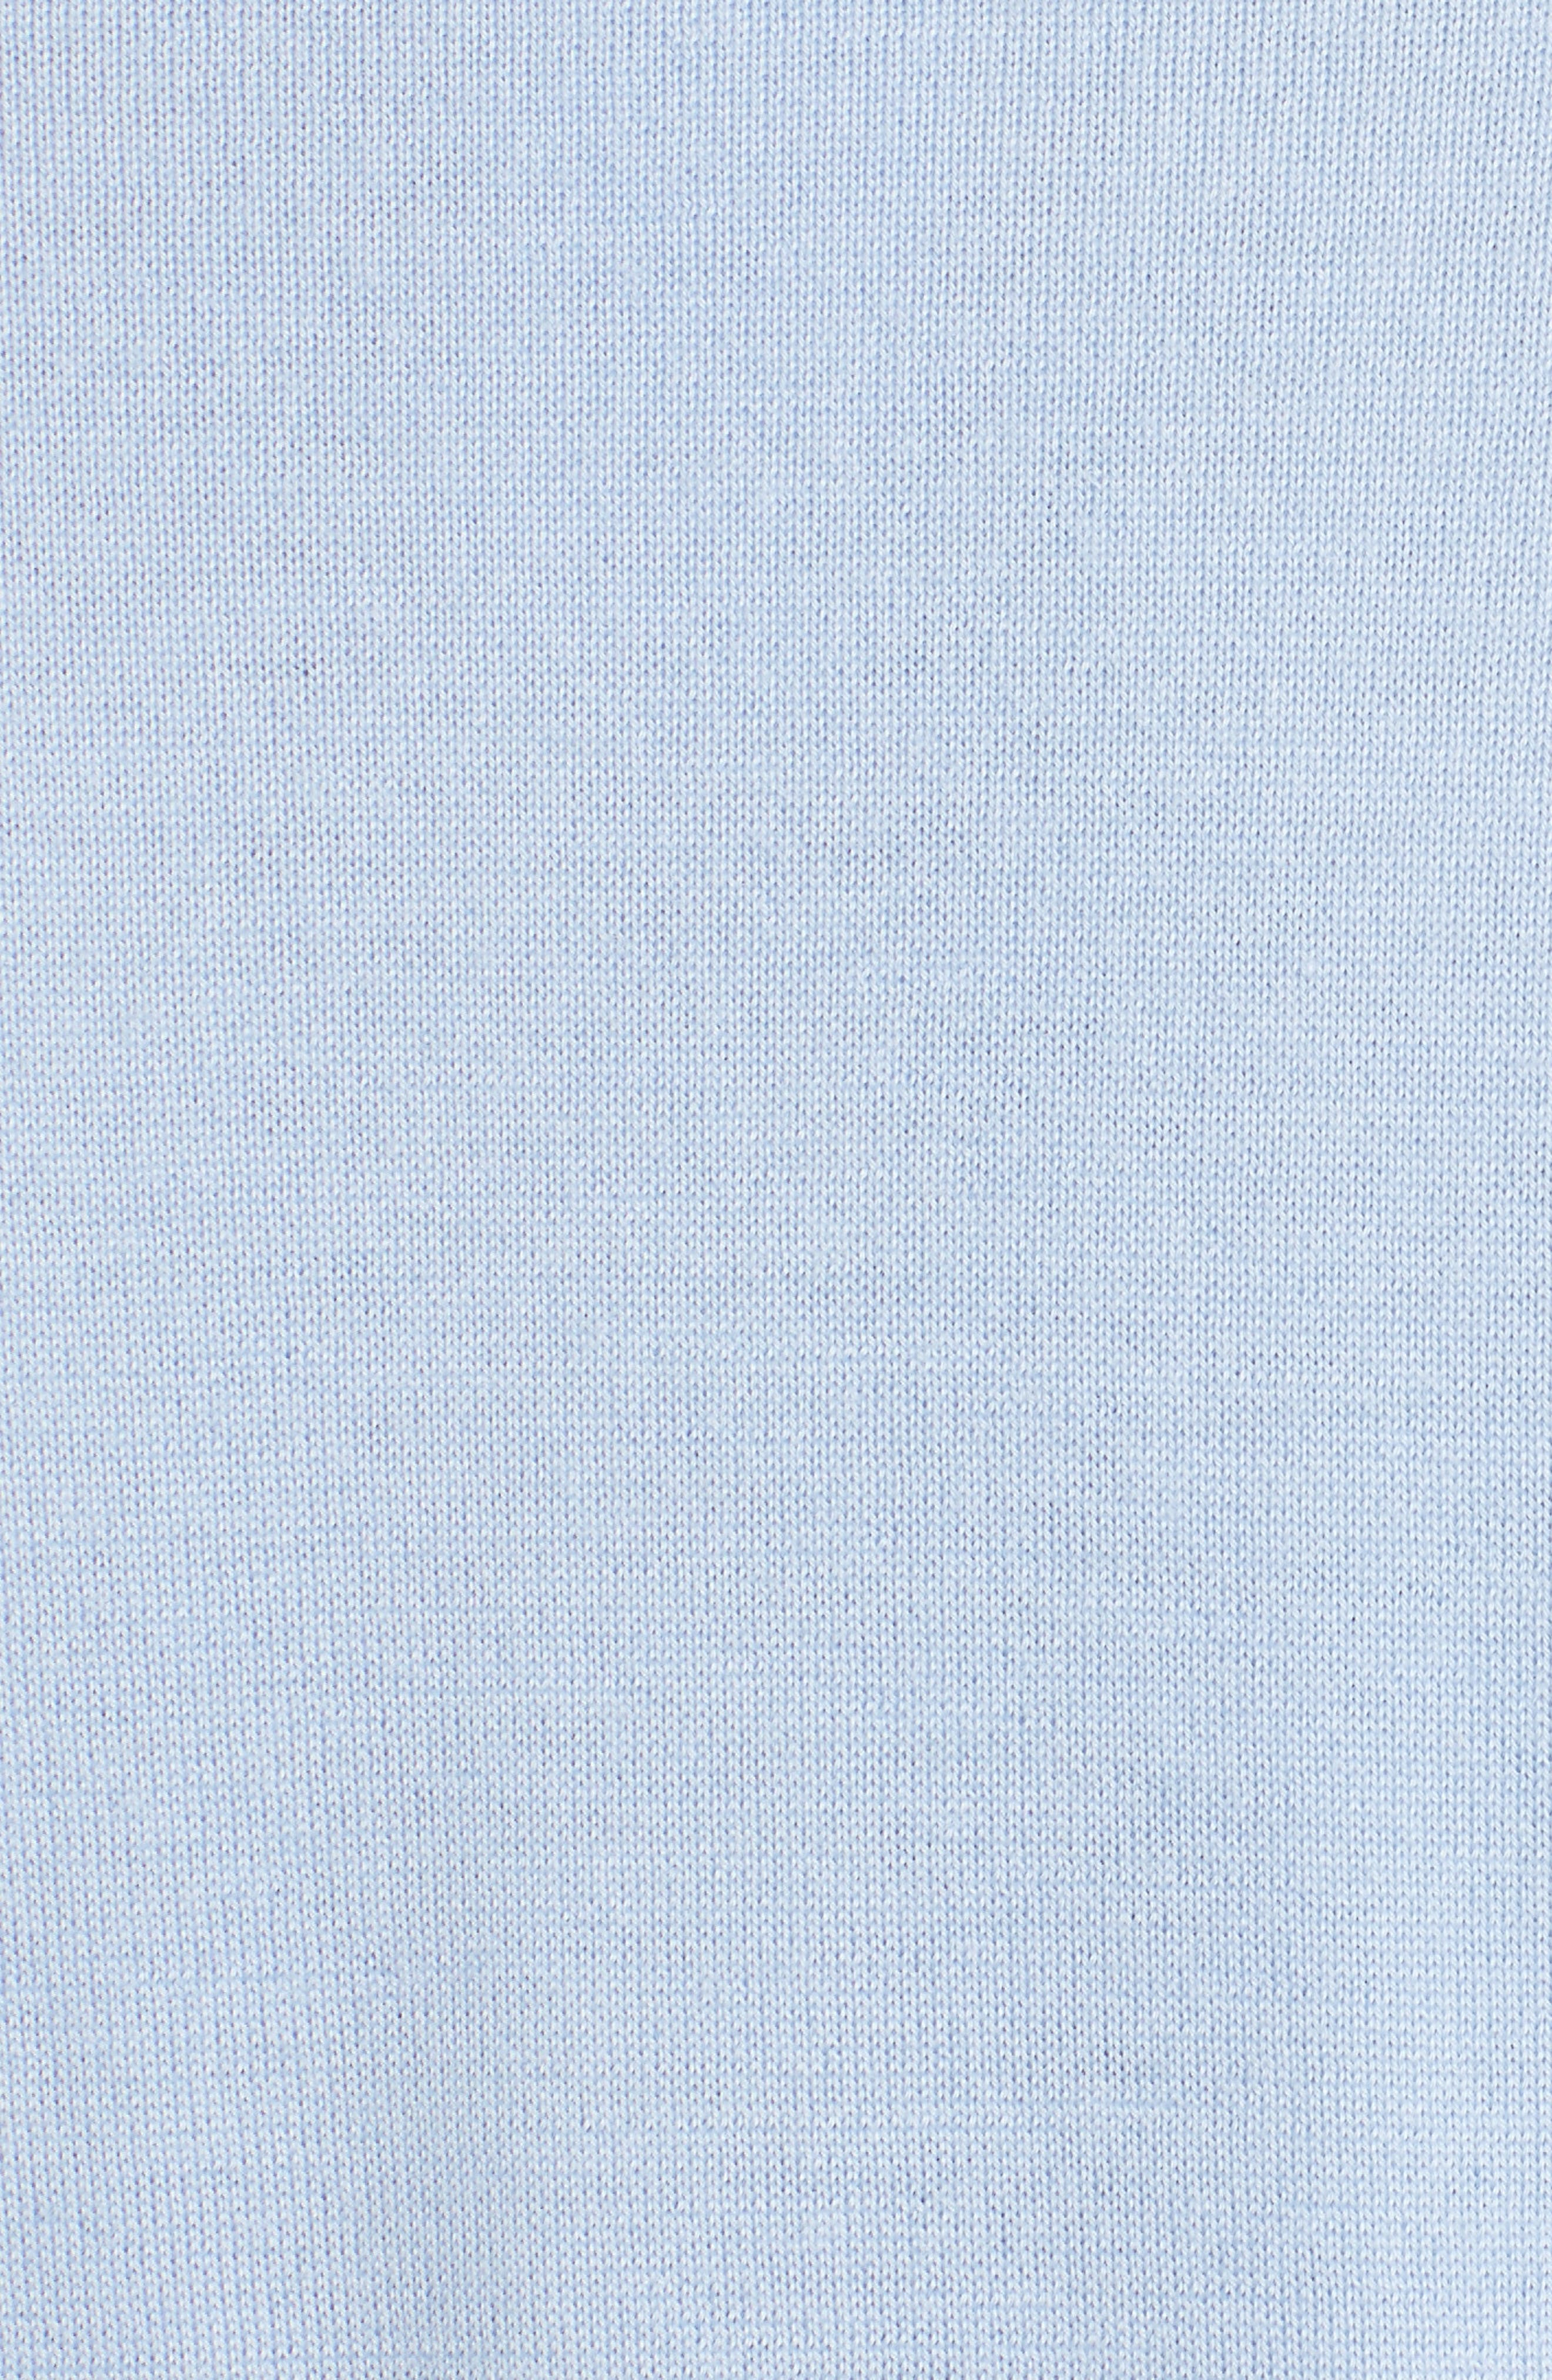 Embellished Cashmere & Silk Button Cardigan,                             Alternate thumbnail 5, color,                             450